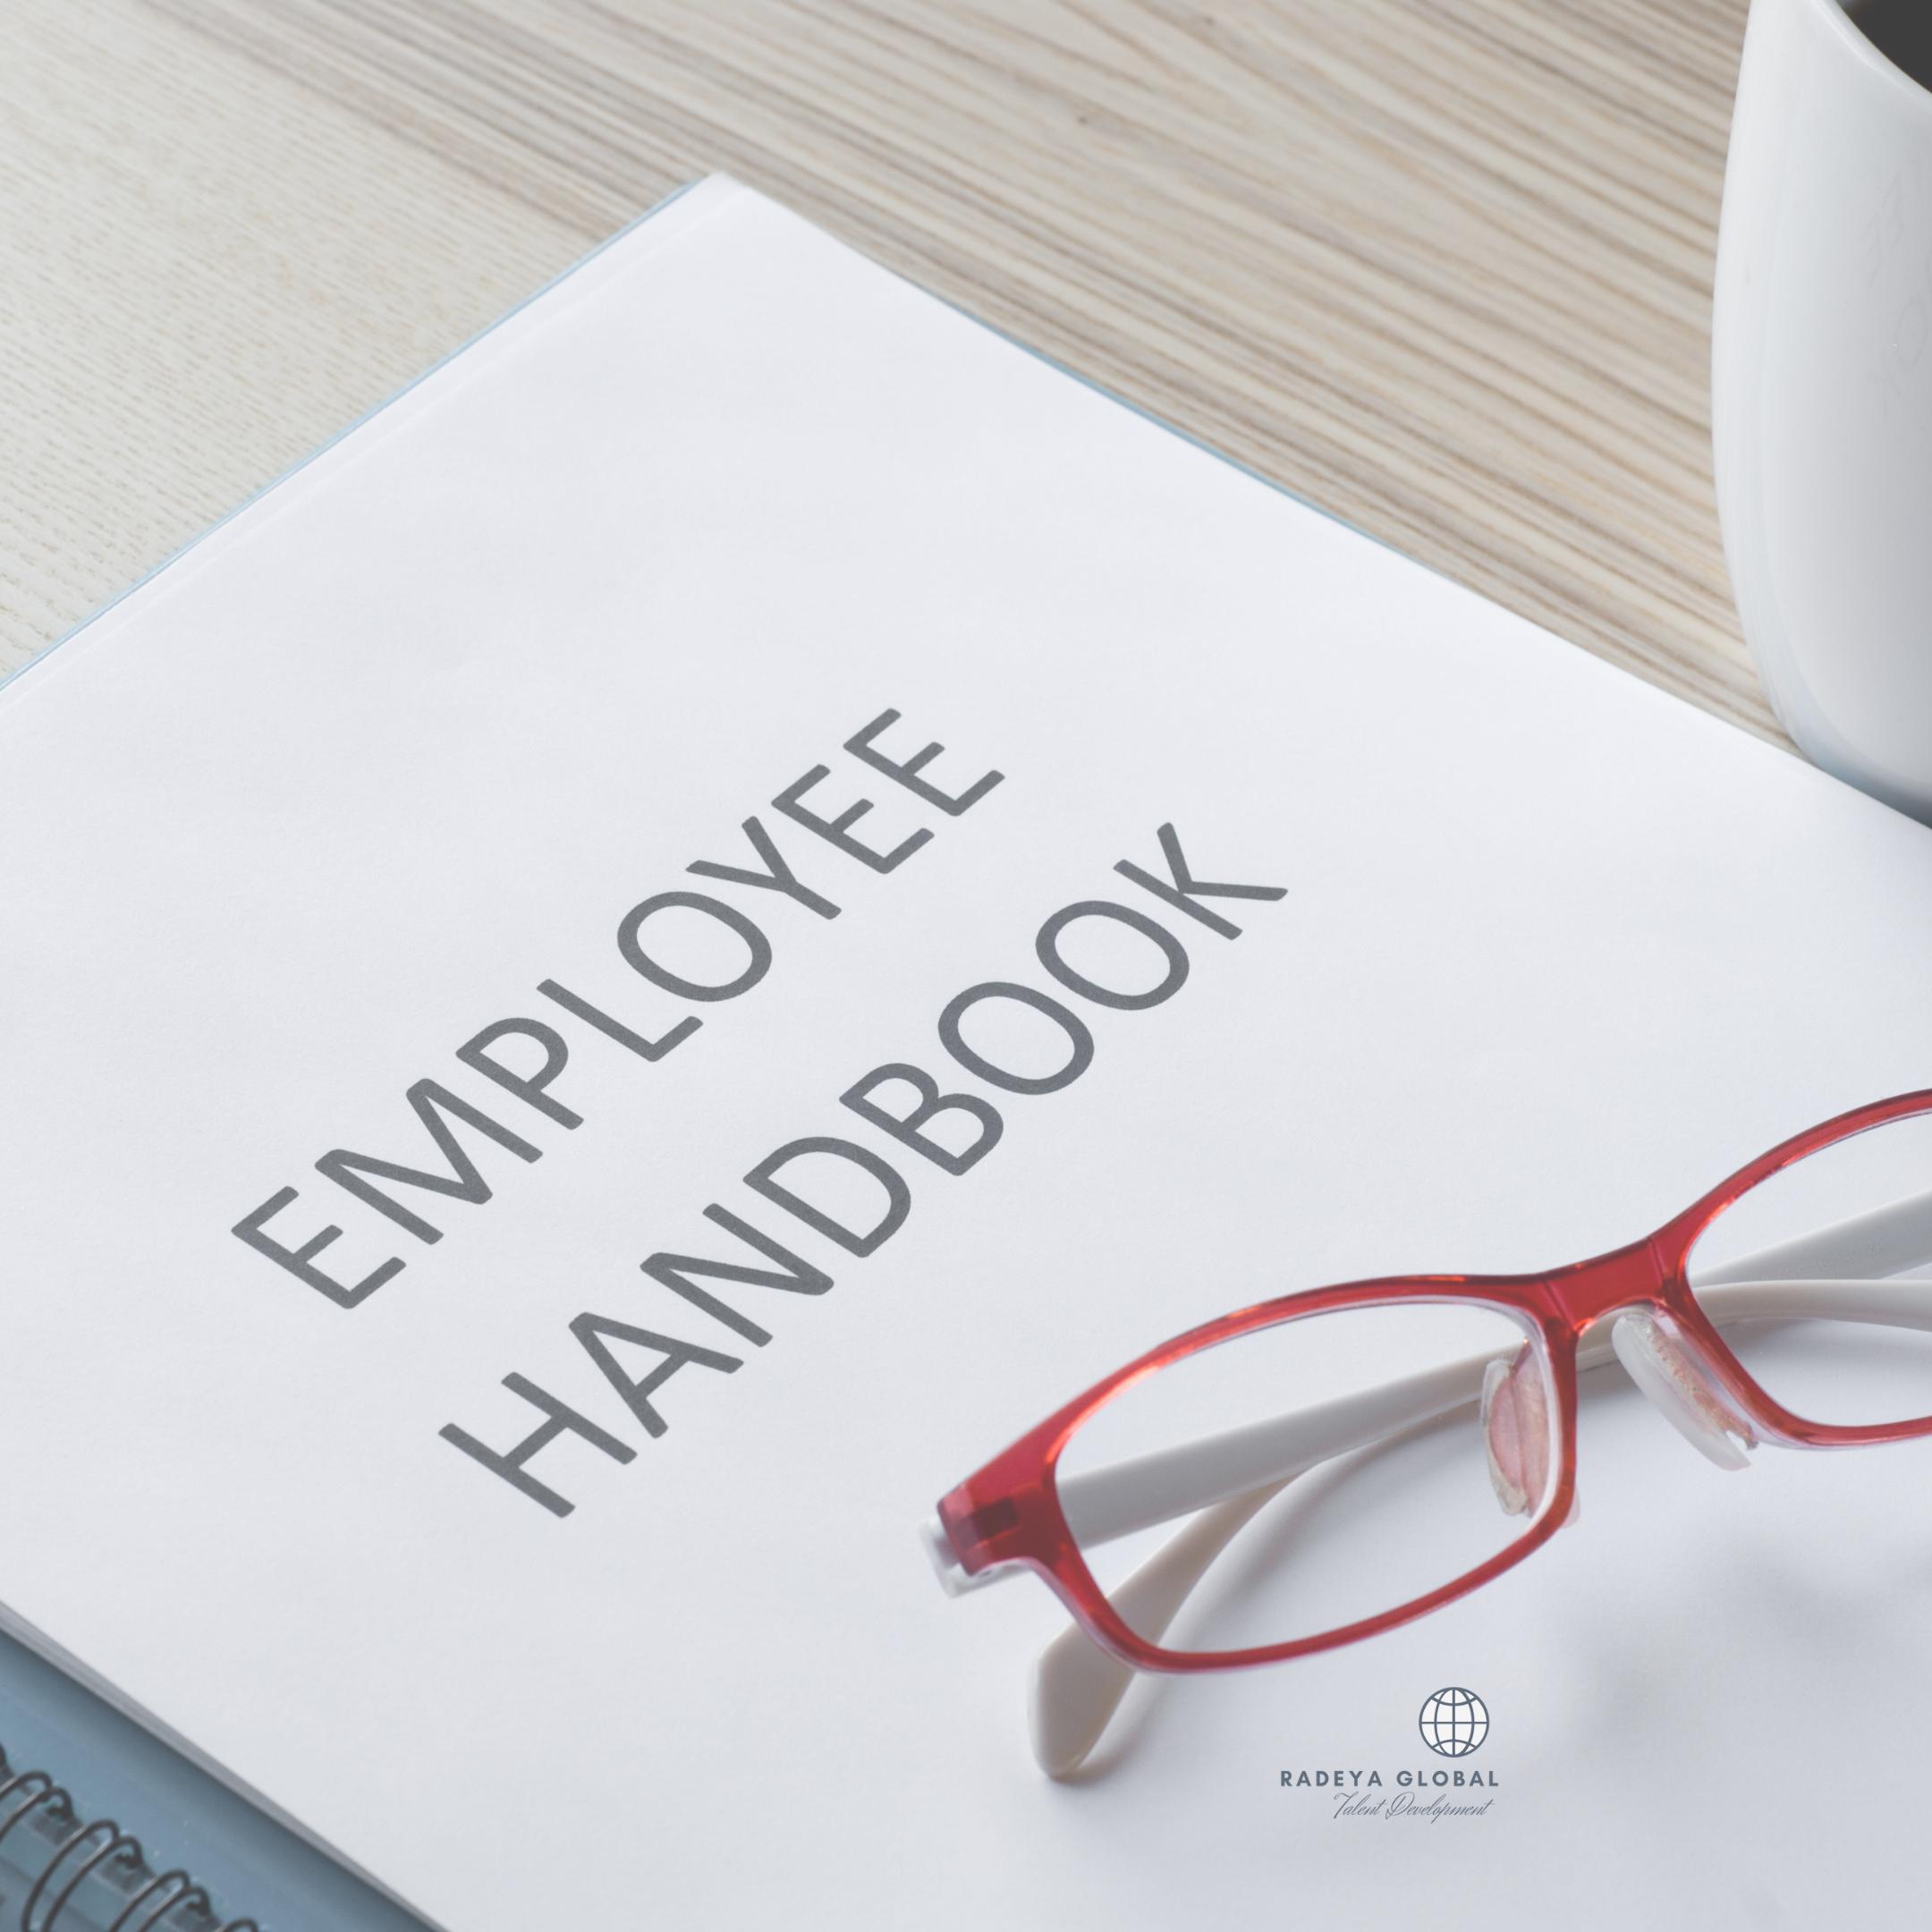 Employee handbook plus red glasses on desk